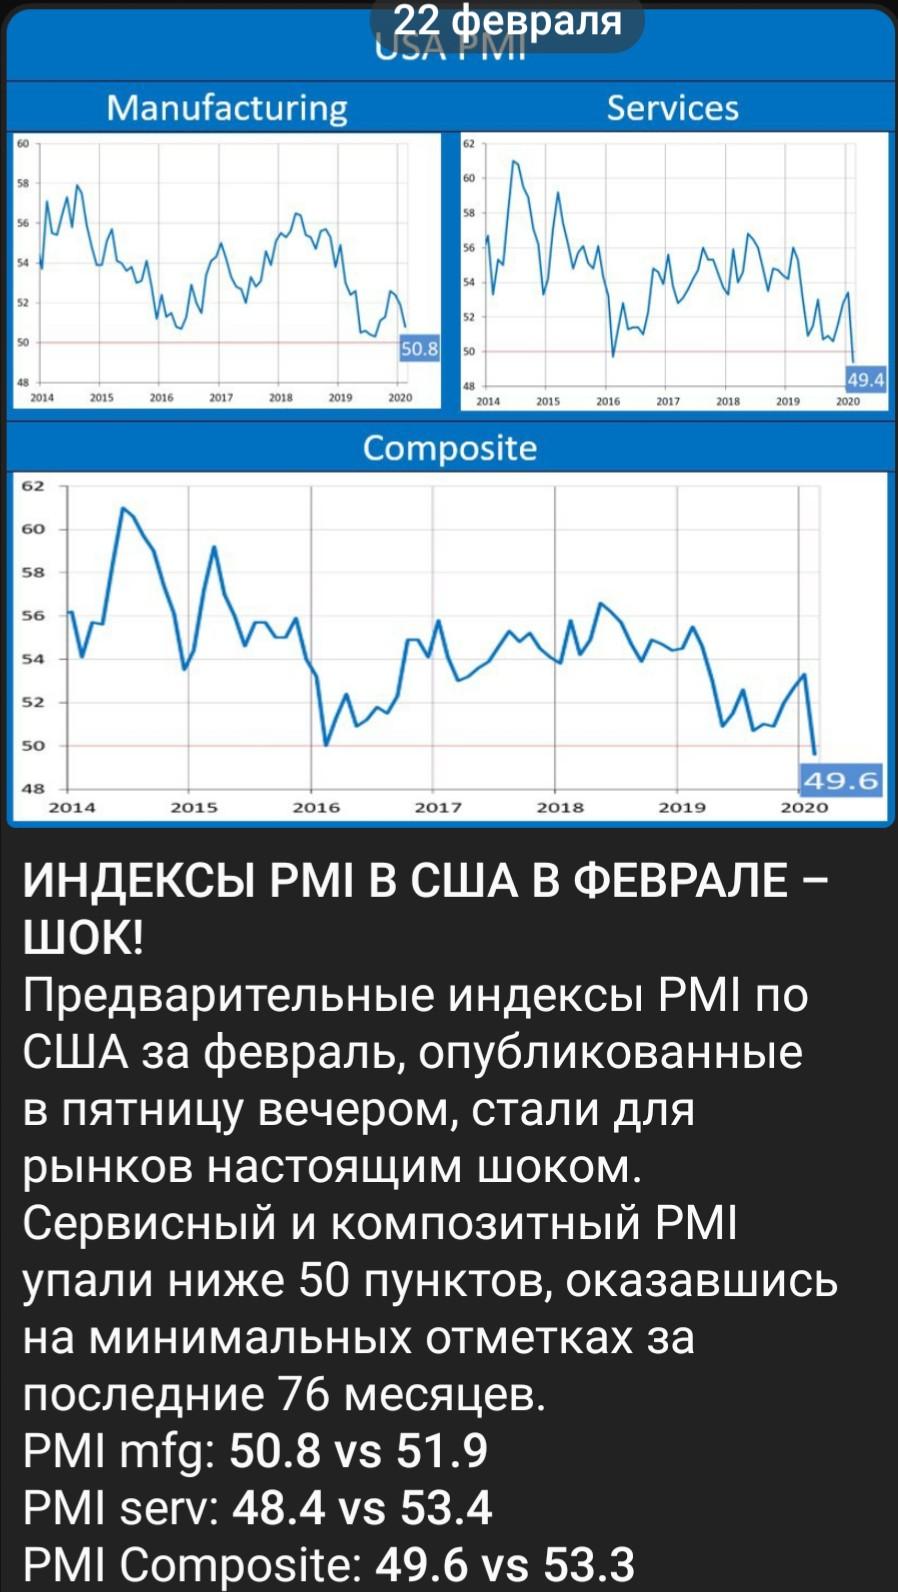 Screenshot_2020-02-22-13-55-35-1515421000_EDIT_1.jpg